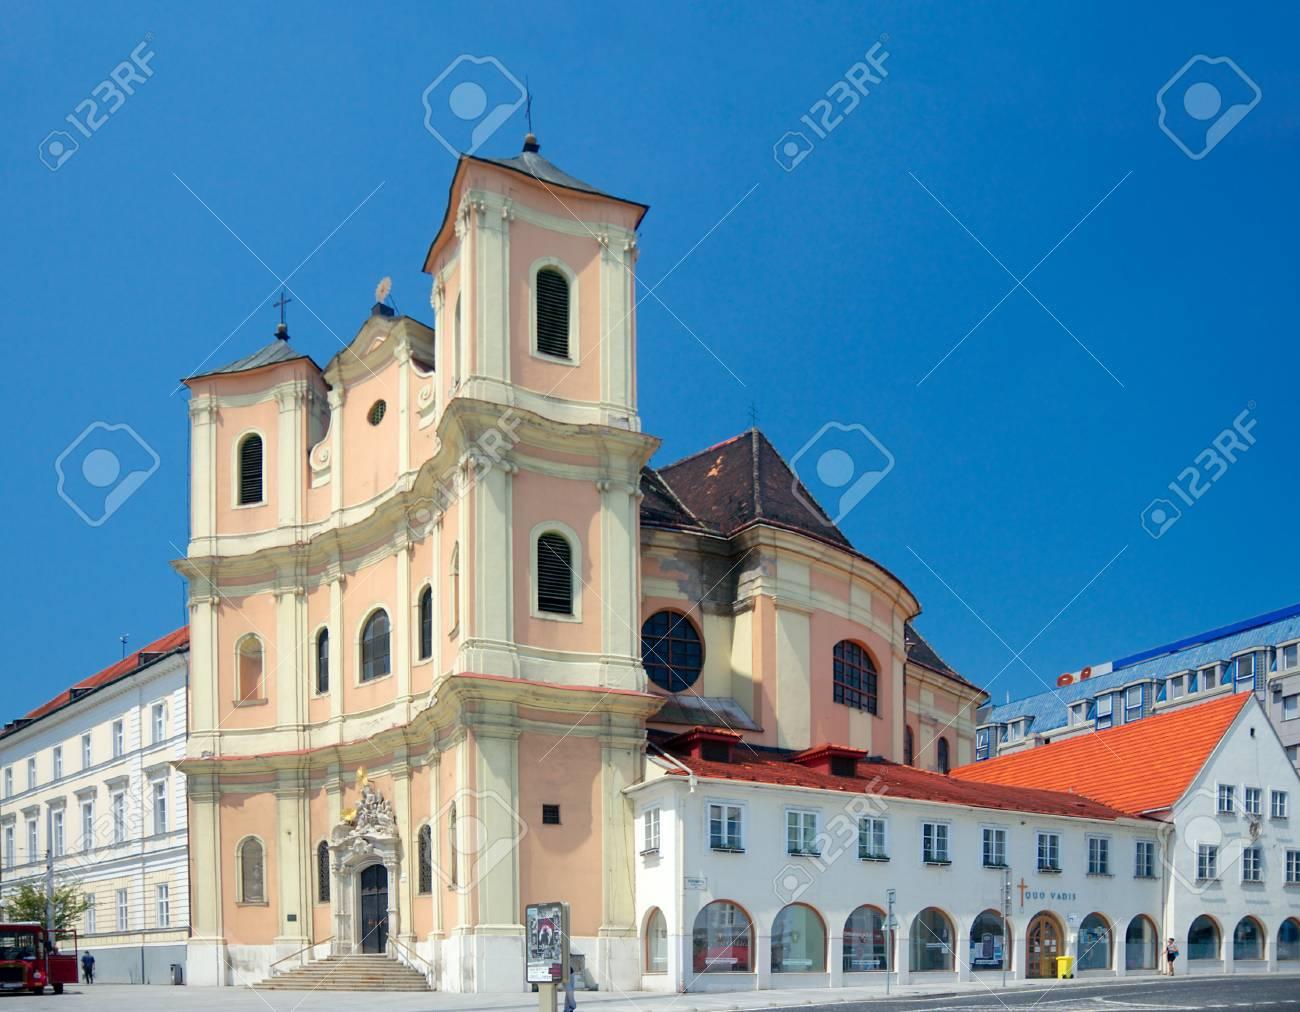 Side view of Trinitarian Church or Trinity Church  full name Church of Saint John of Matha and Saint Felix of Valois, 1717  and the passers-by on the street, Bratislava, Slovakia Stock Photo - 25900781